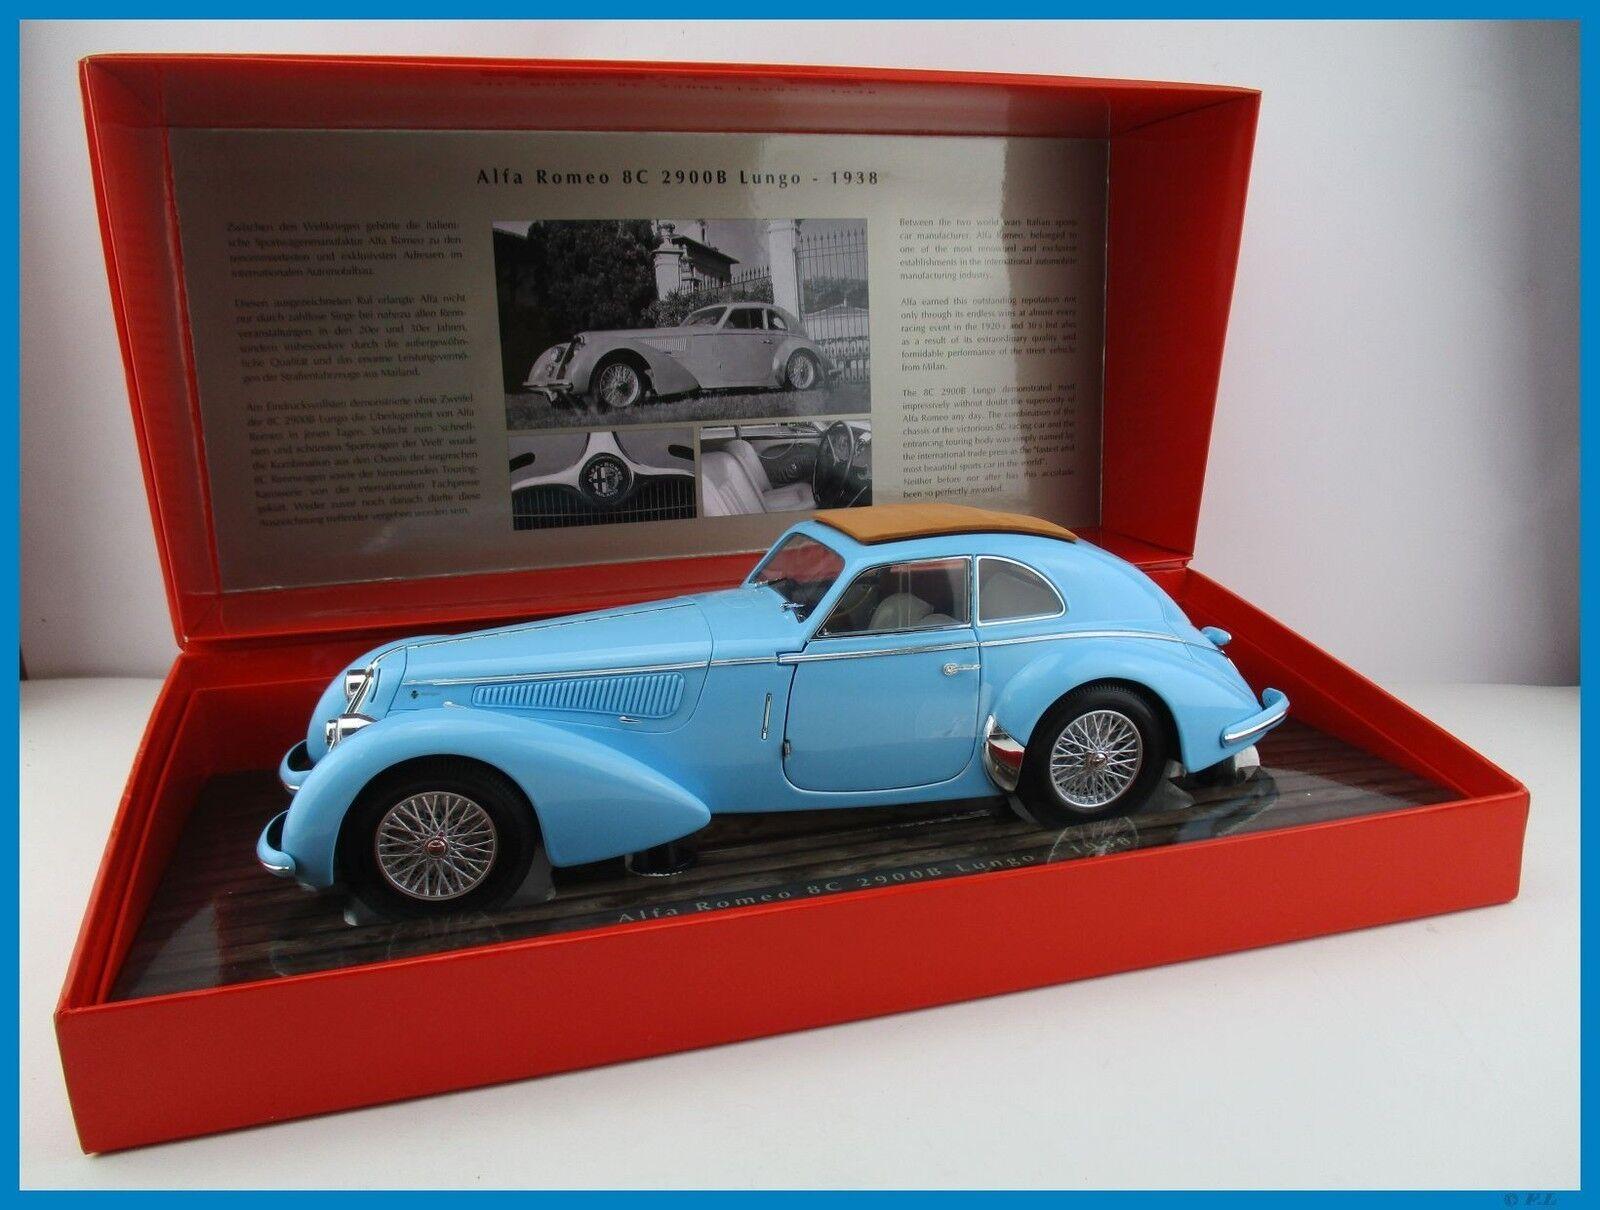 Alfa romeo 8c 2900b lungo 1938 in hellblau minichamps 1,18 neu ovp